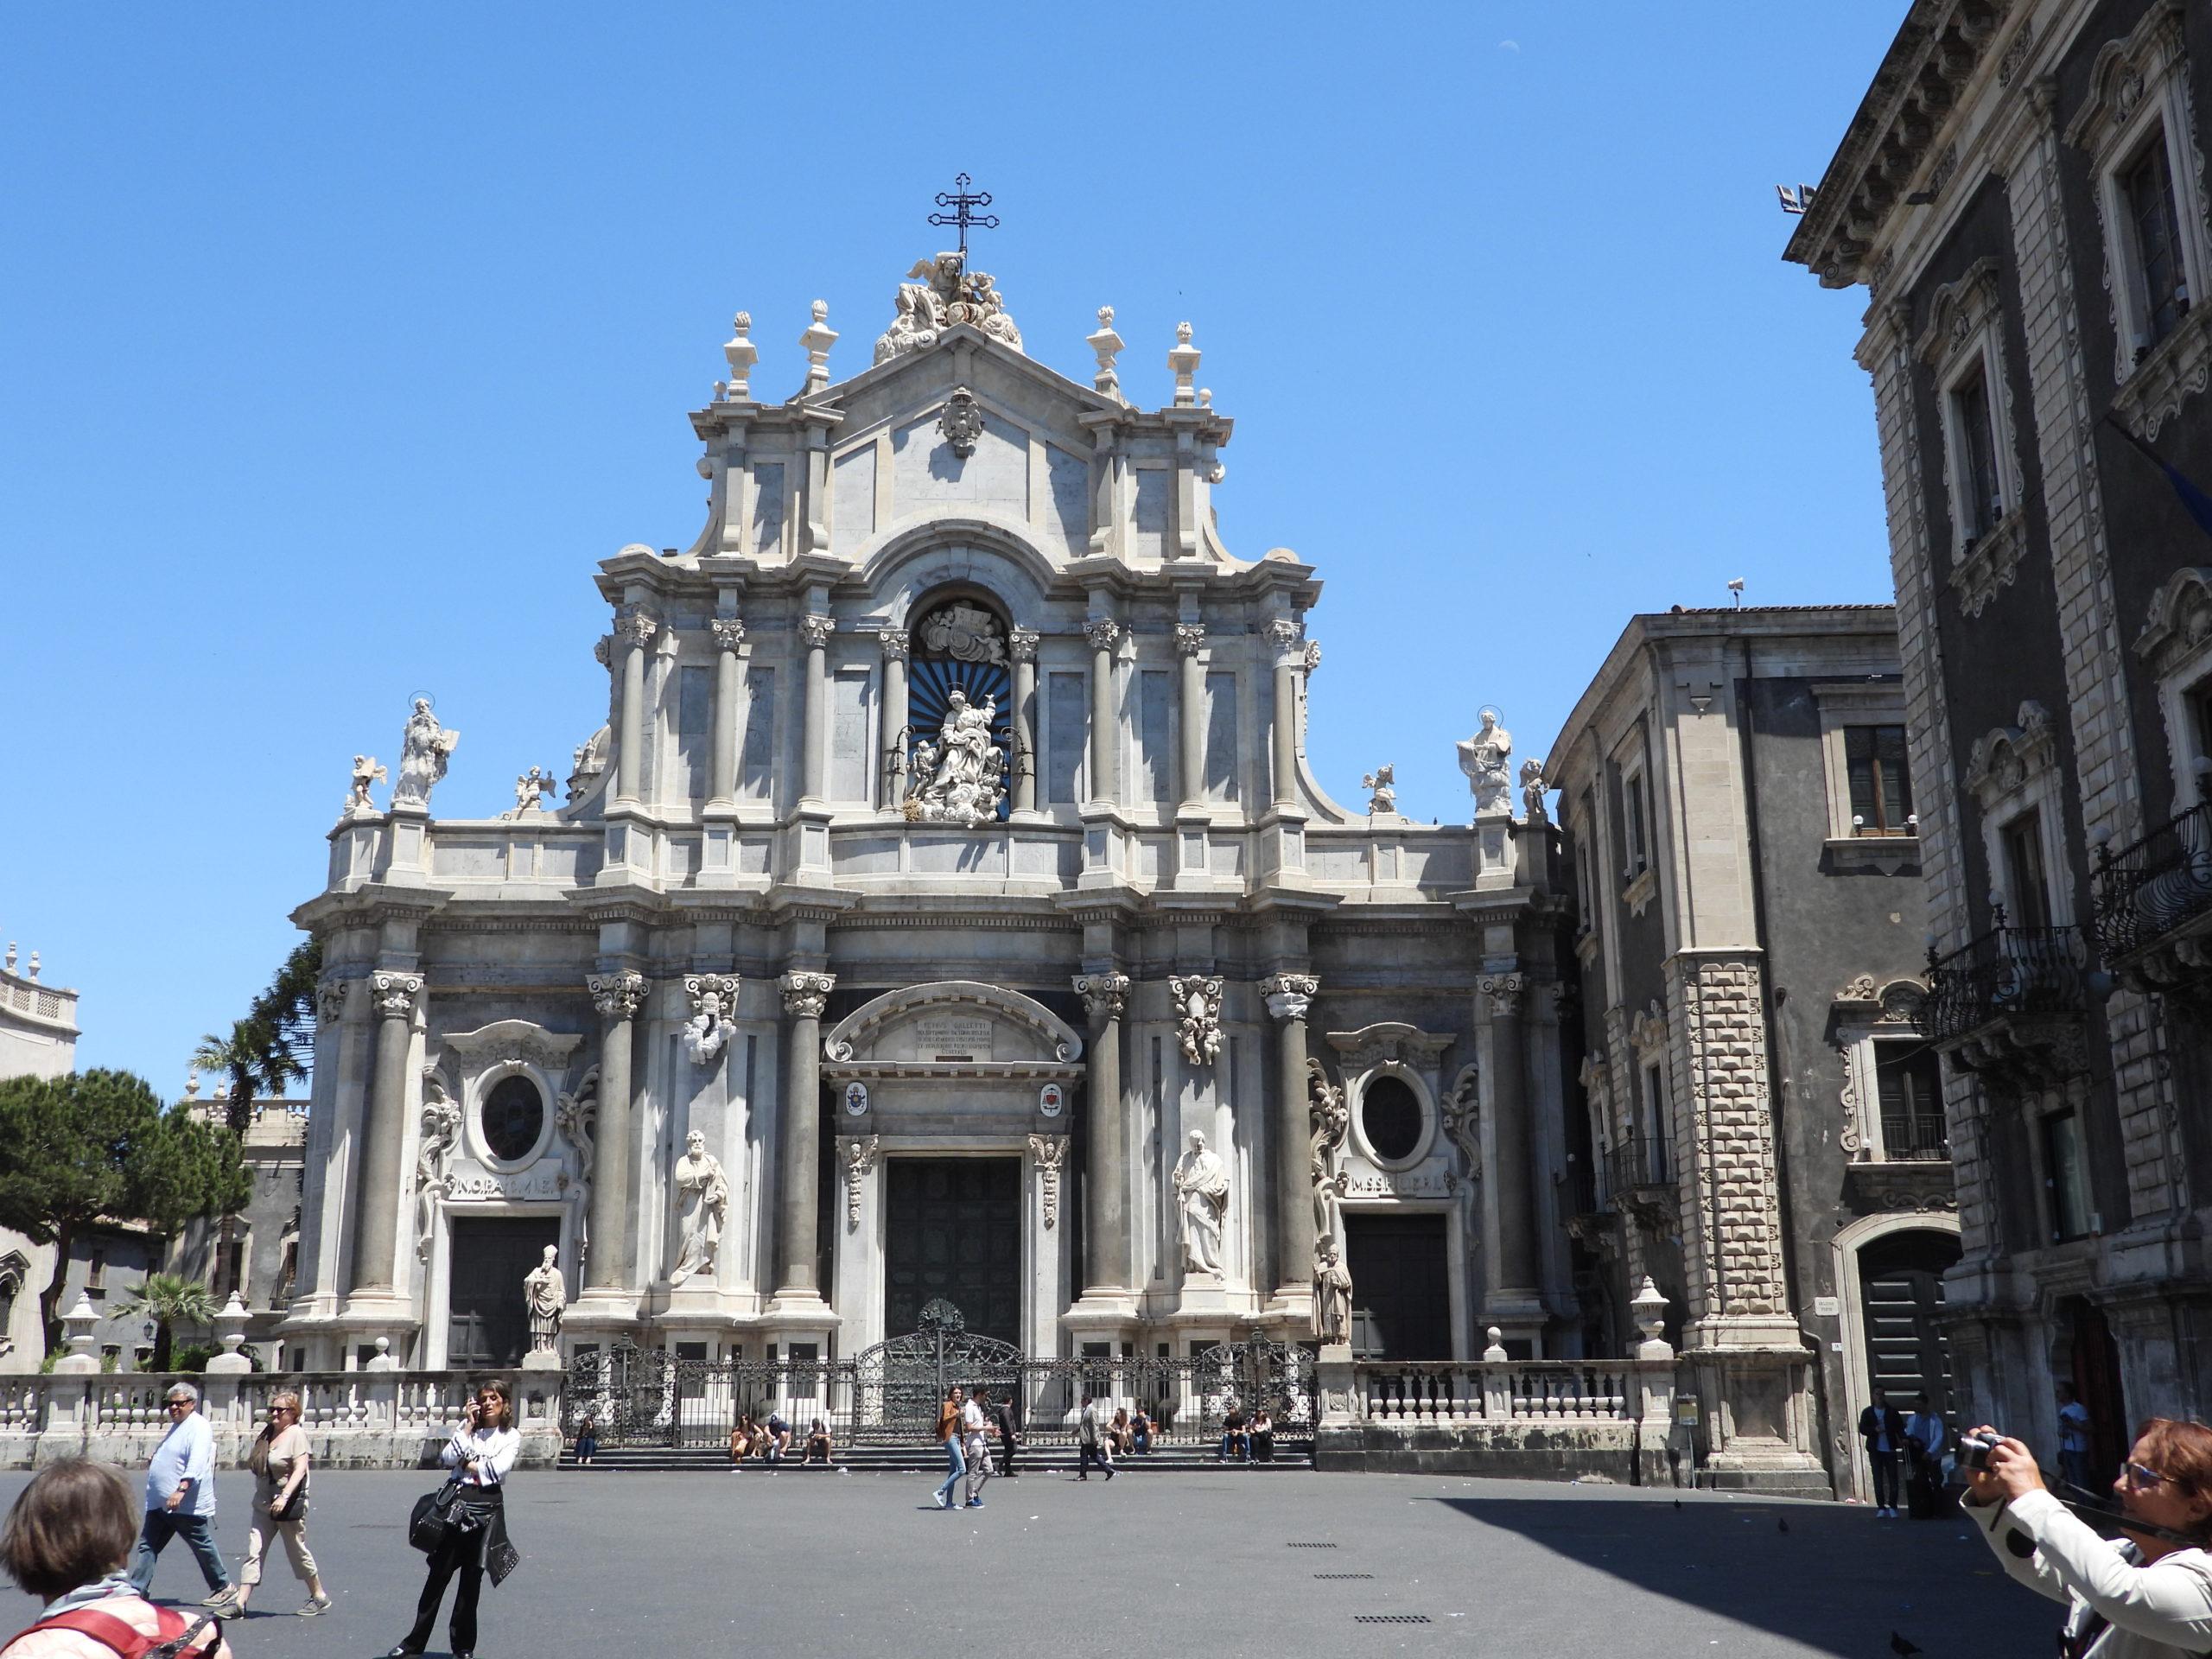 10 mai - CATANE - Piazza Duomo (1)